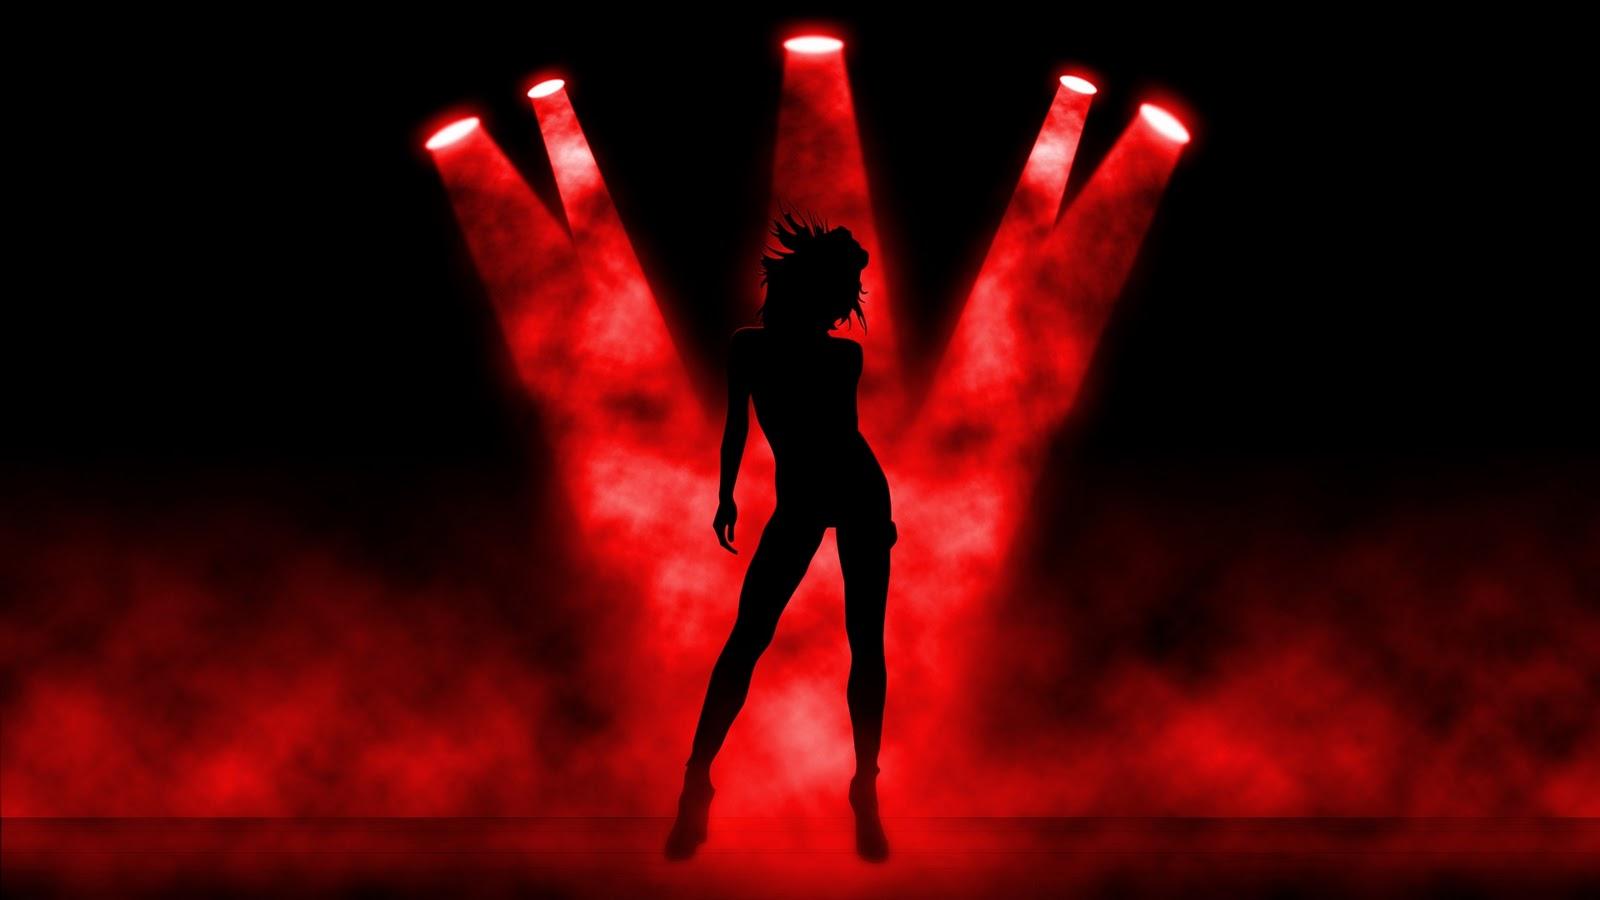 http://4.bp.blogspot.com/-TXvr5R8iN0A/TVkaa4ADj9I/AAAAAAAAAB0/2oi1T8izFYI/s1600/Dance_Girl.jpg